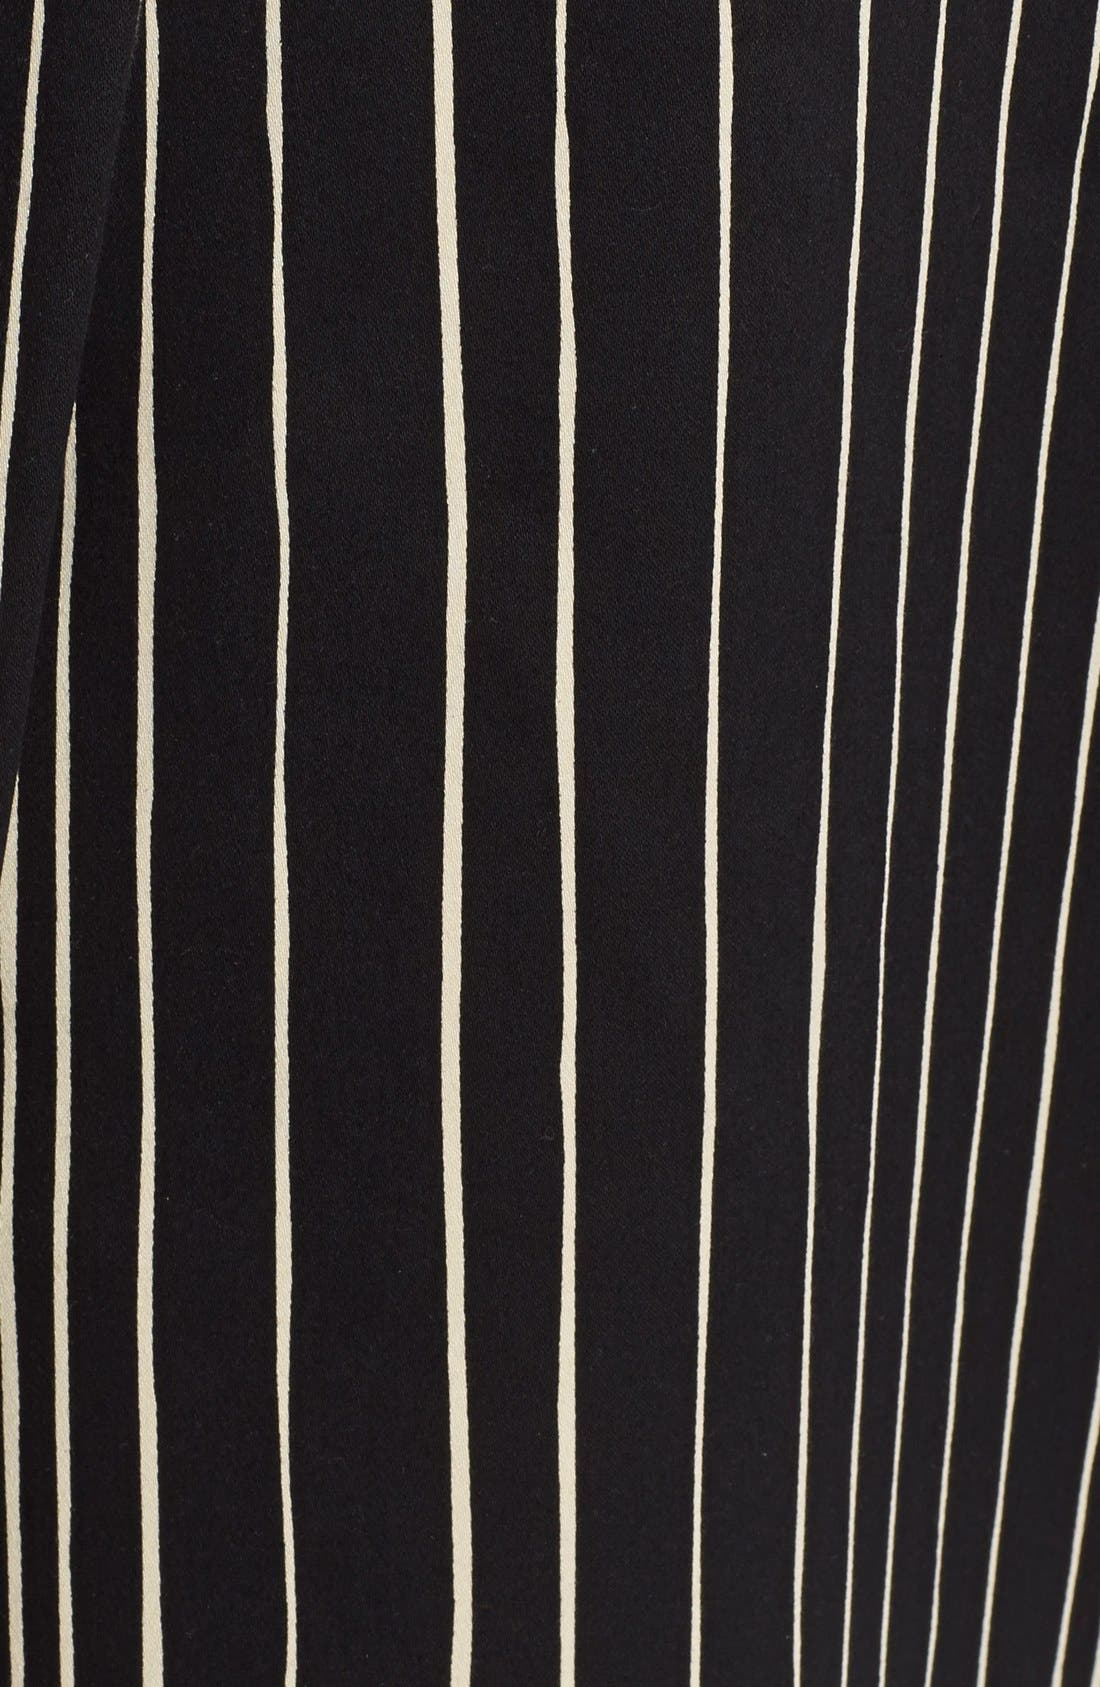 Alternate Image 5  - Alice + Olivia 'Libby' Stripe Flared Skirt